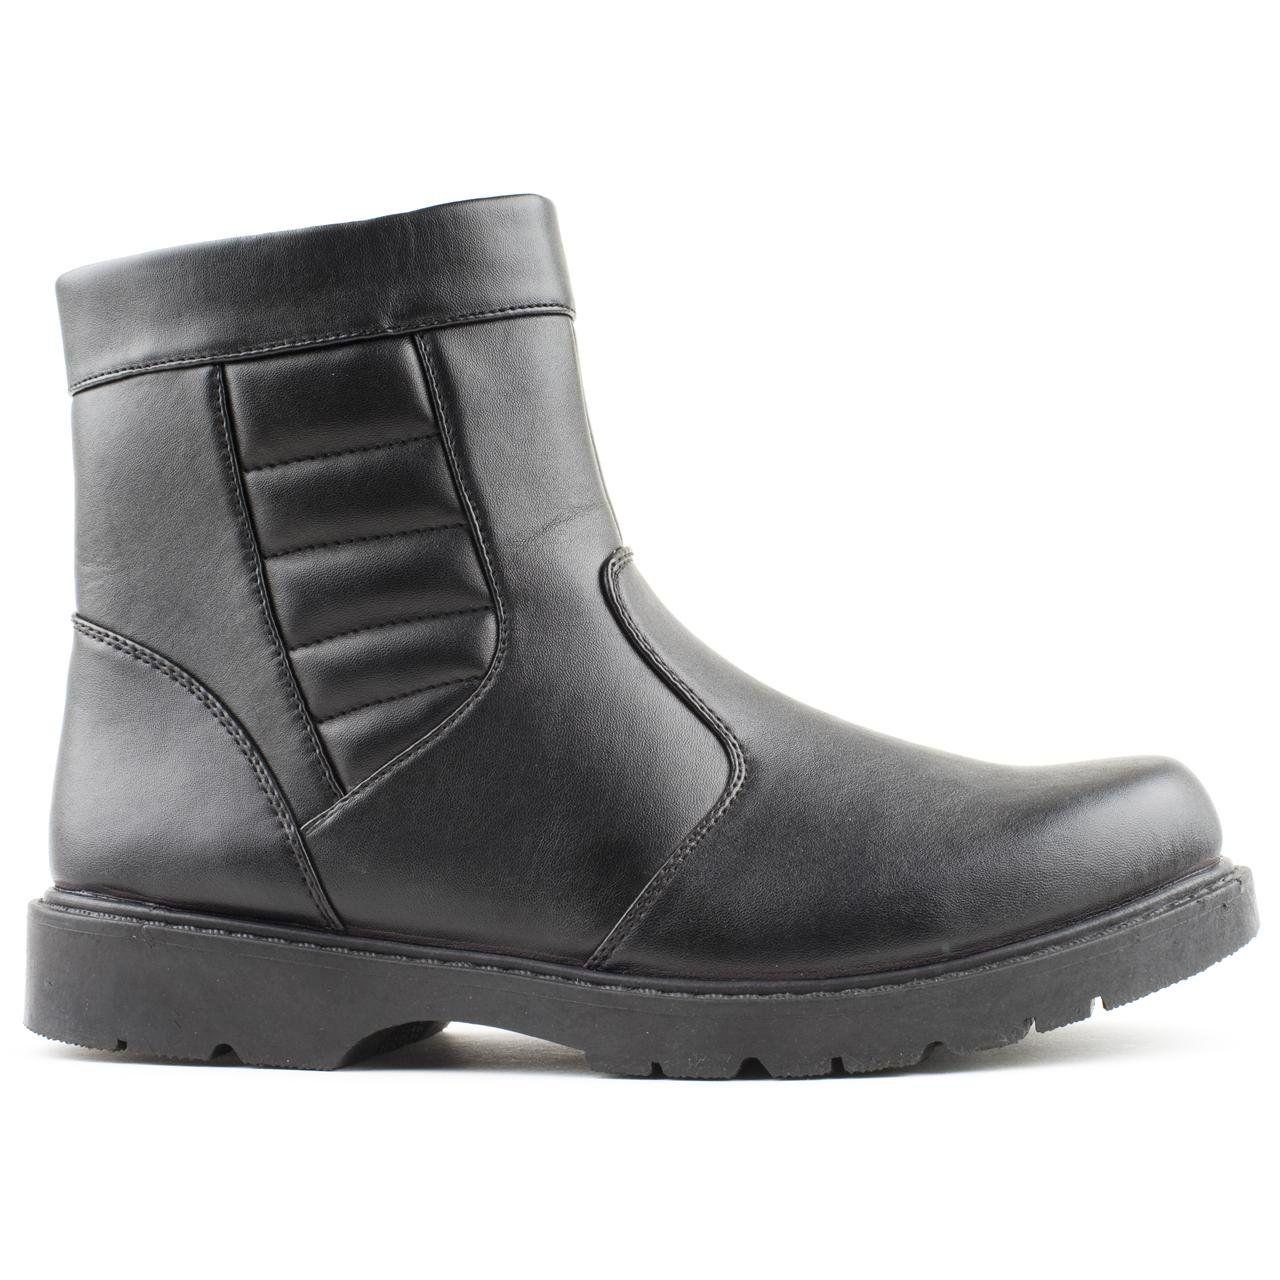 54219c17ebdf9 Caravelle Mens Brutus Black Casual Boots: Amazon.co.uk: Shoes & Bags ...